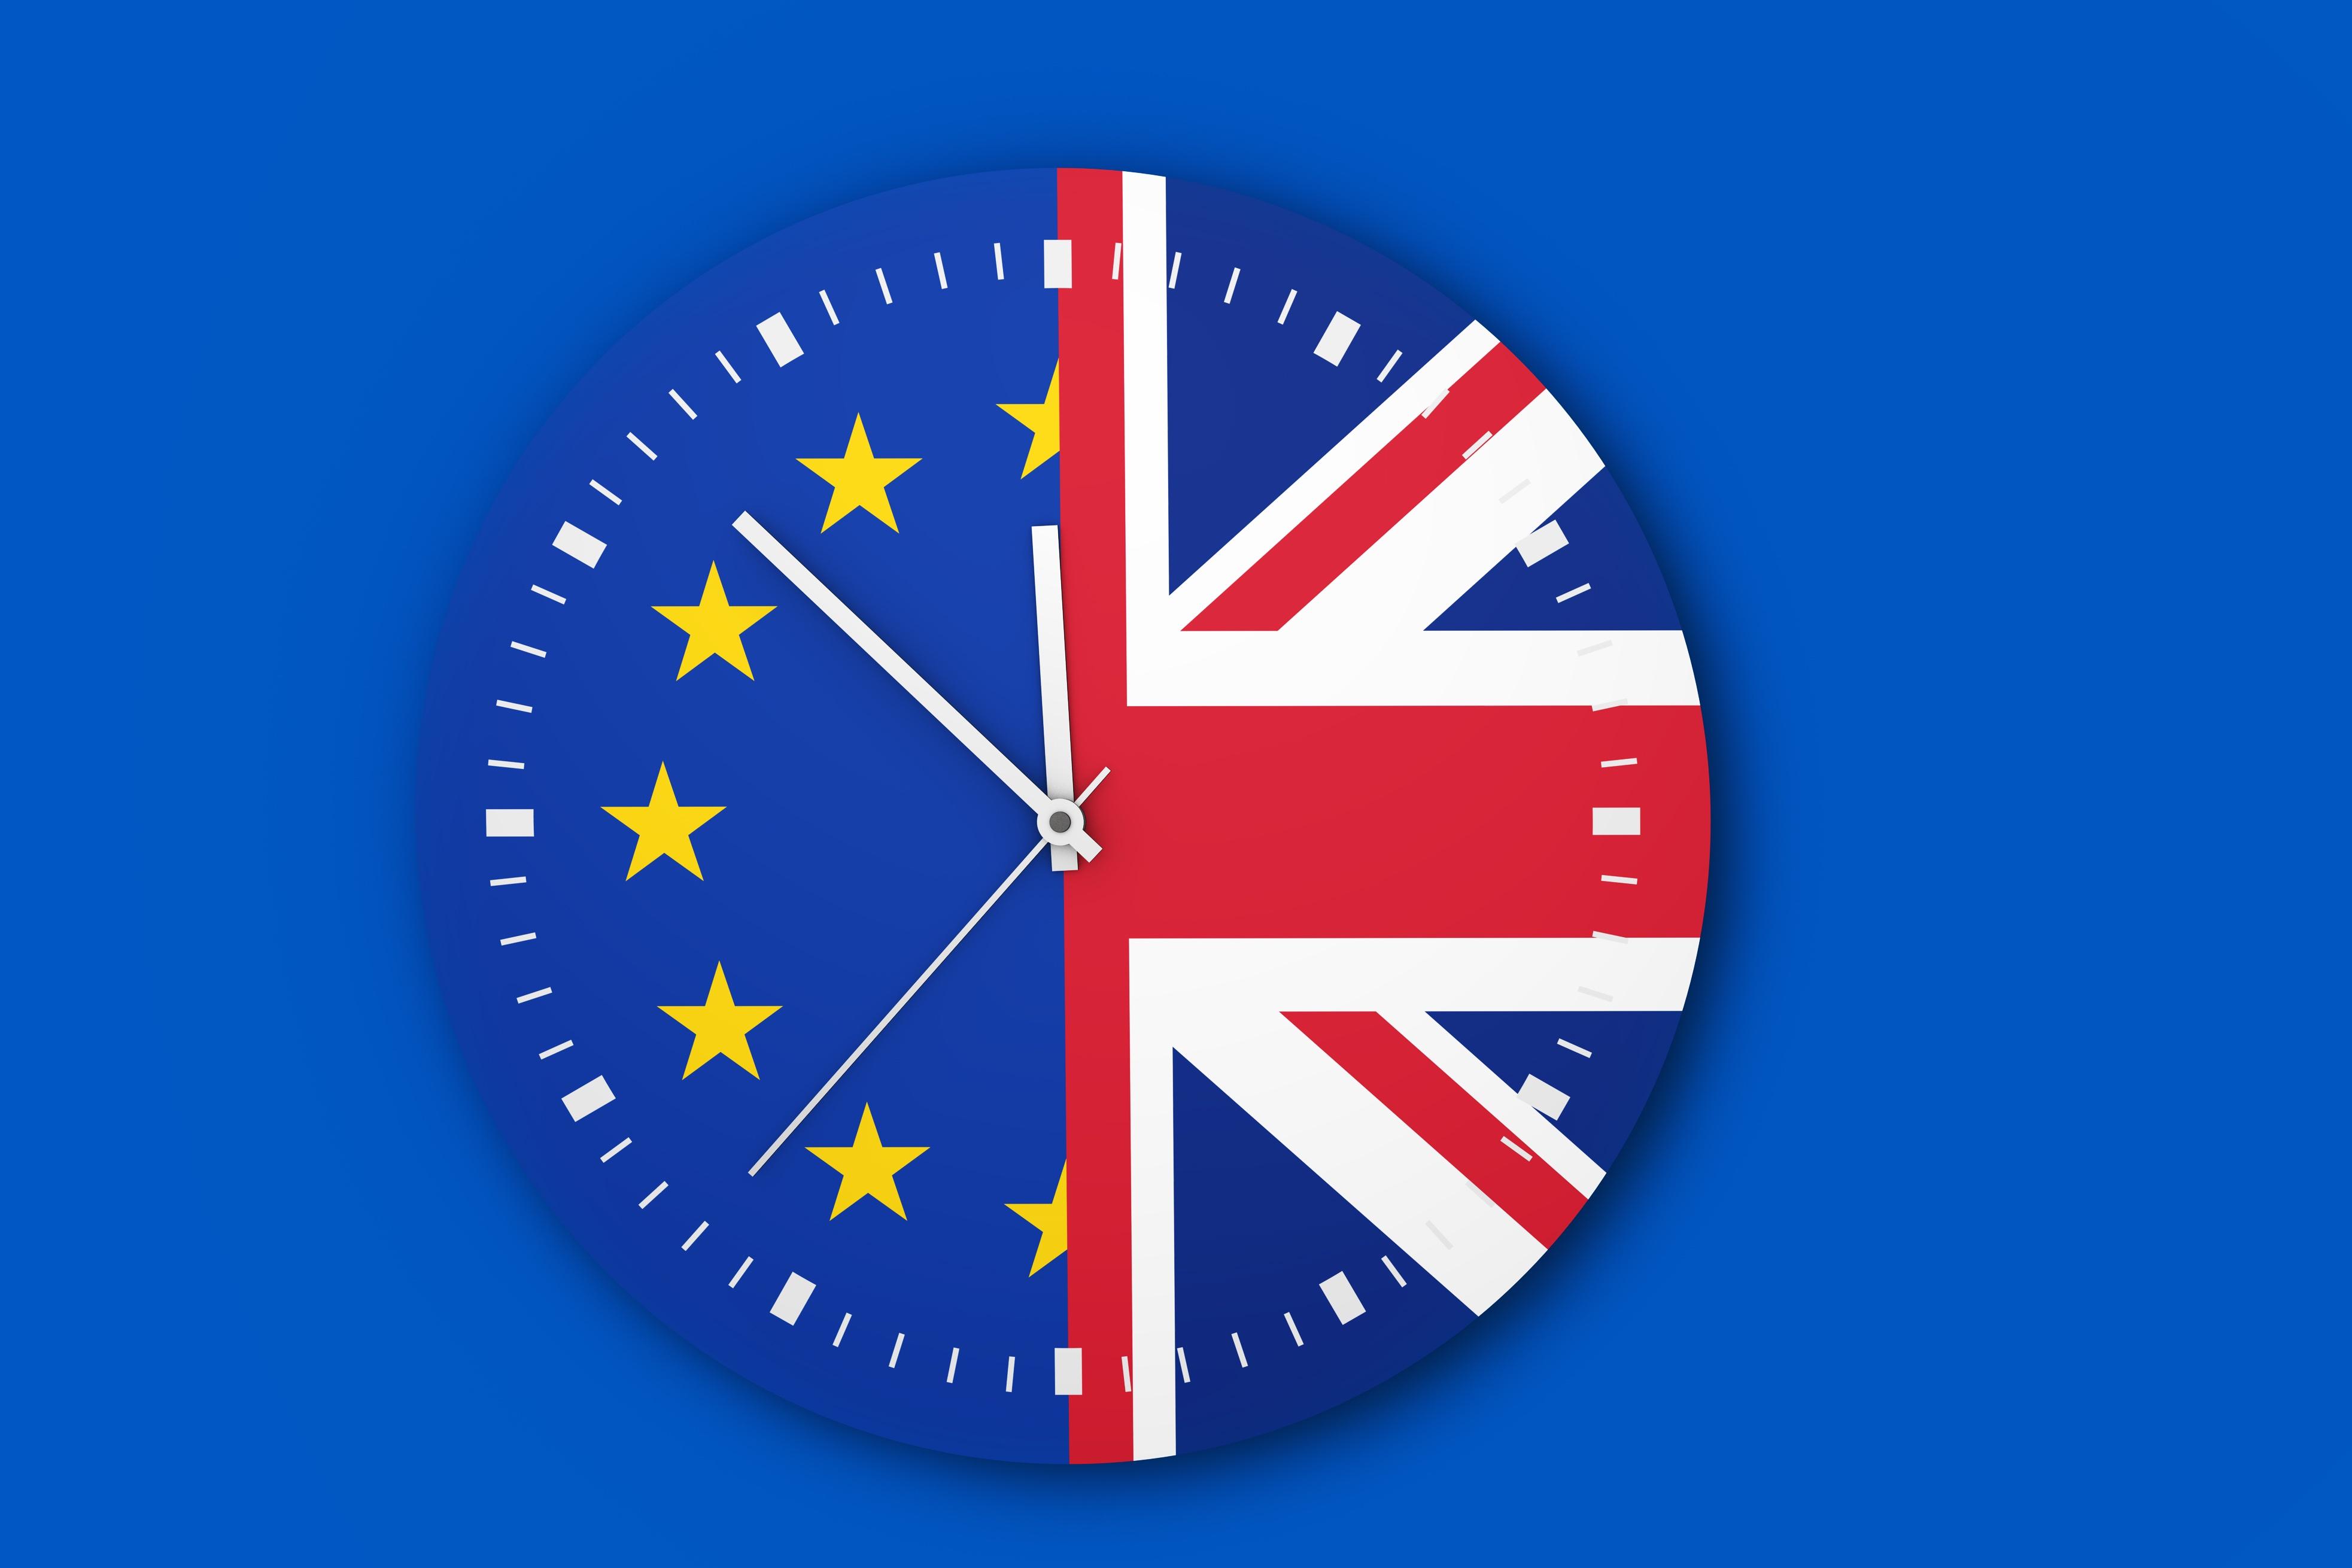 EUR/GBP - Bears in control? (video) - MarketPulseMarketPulse